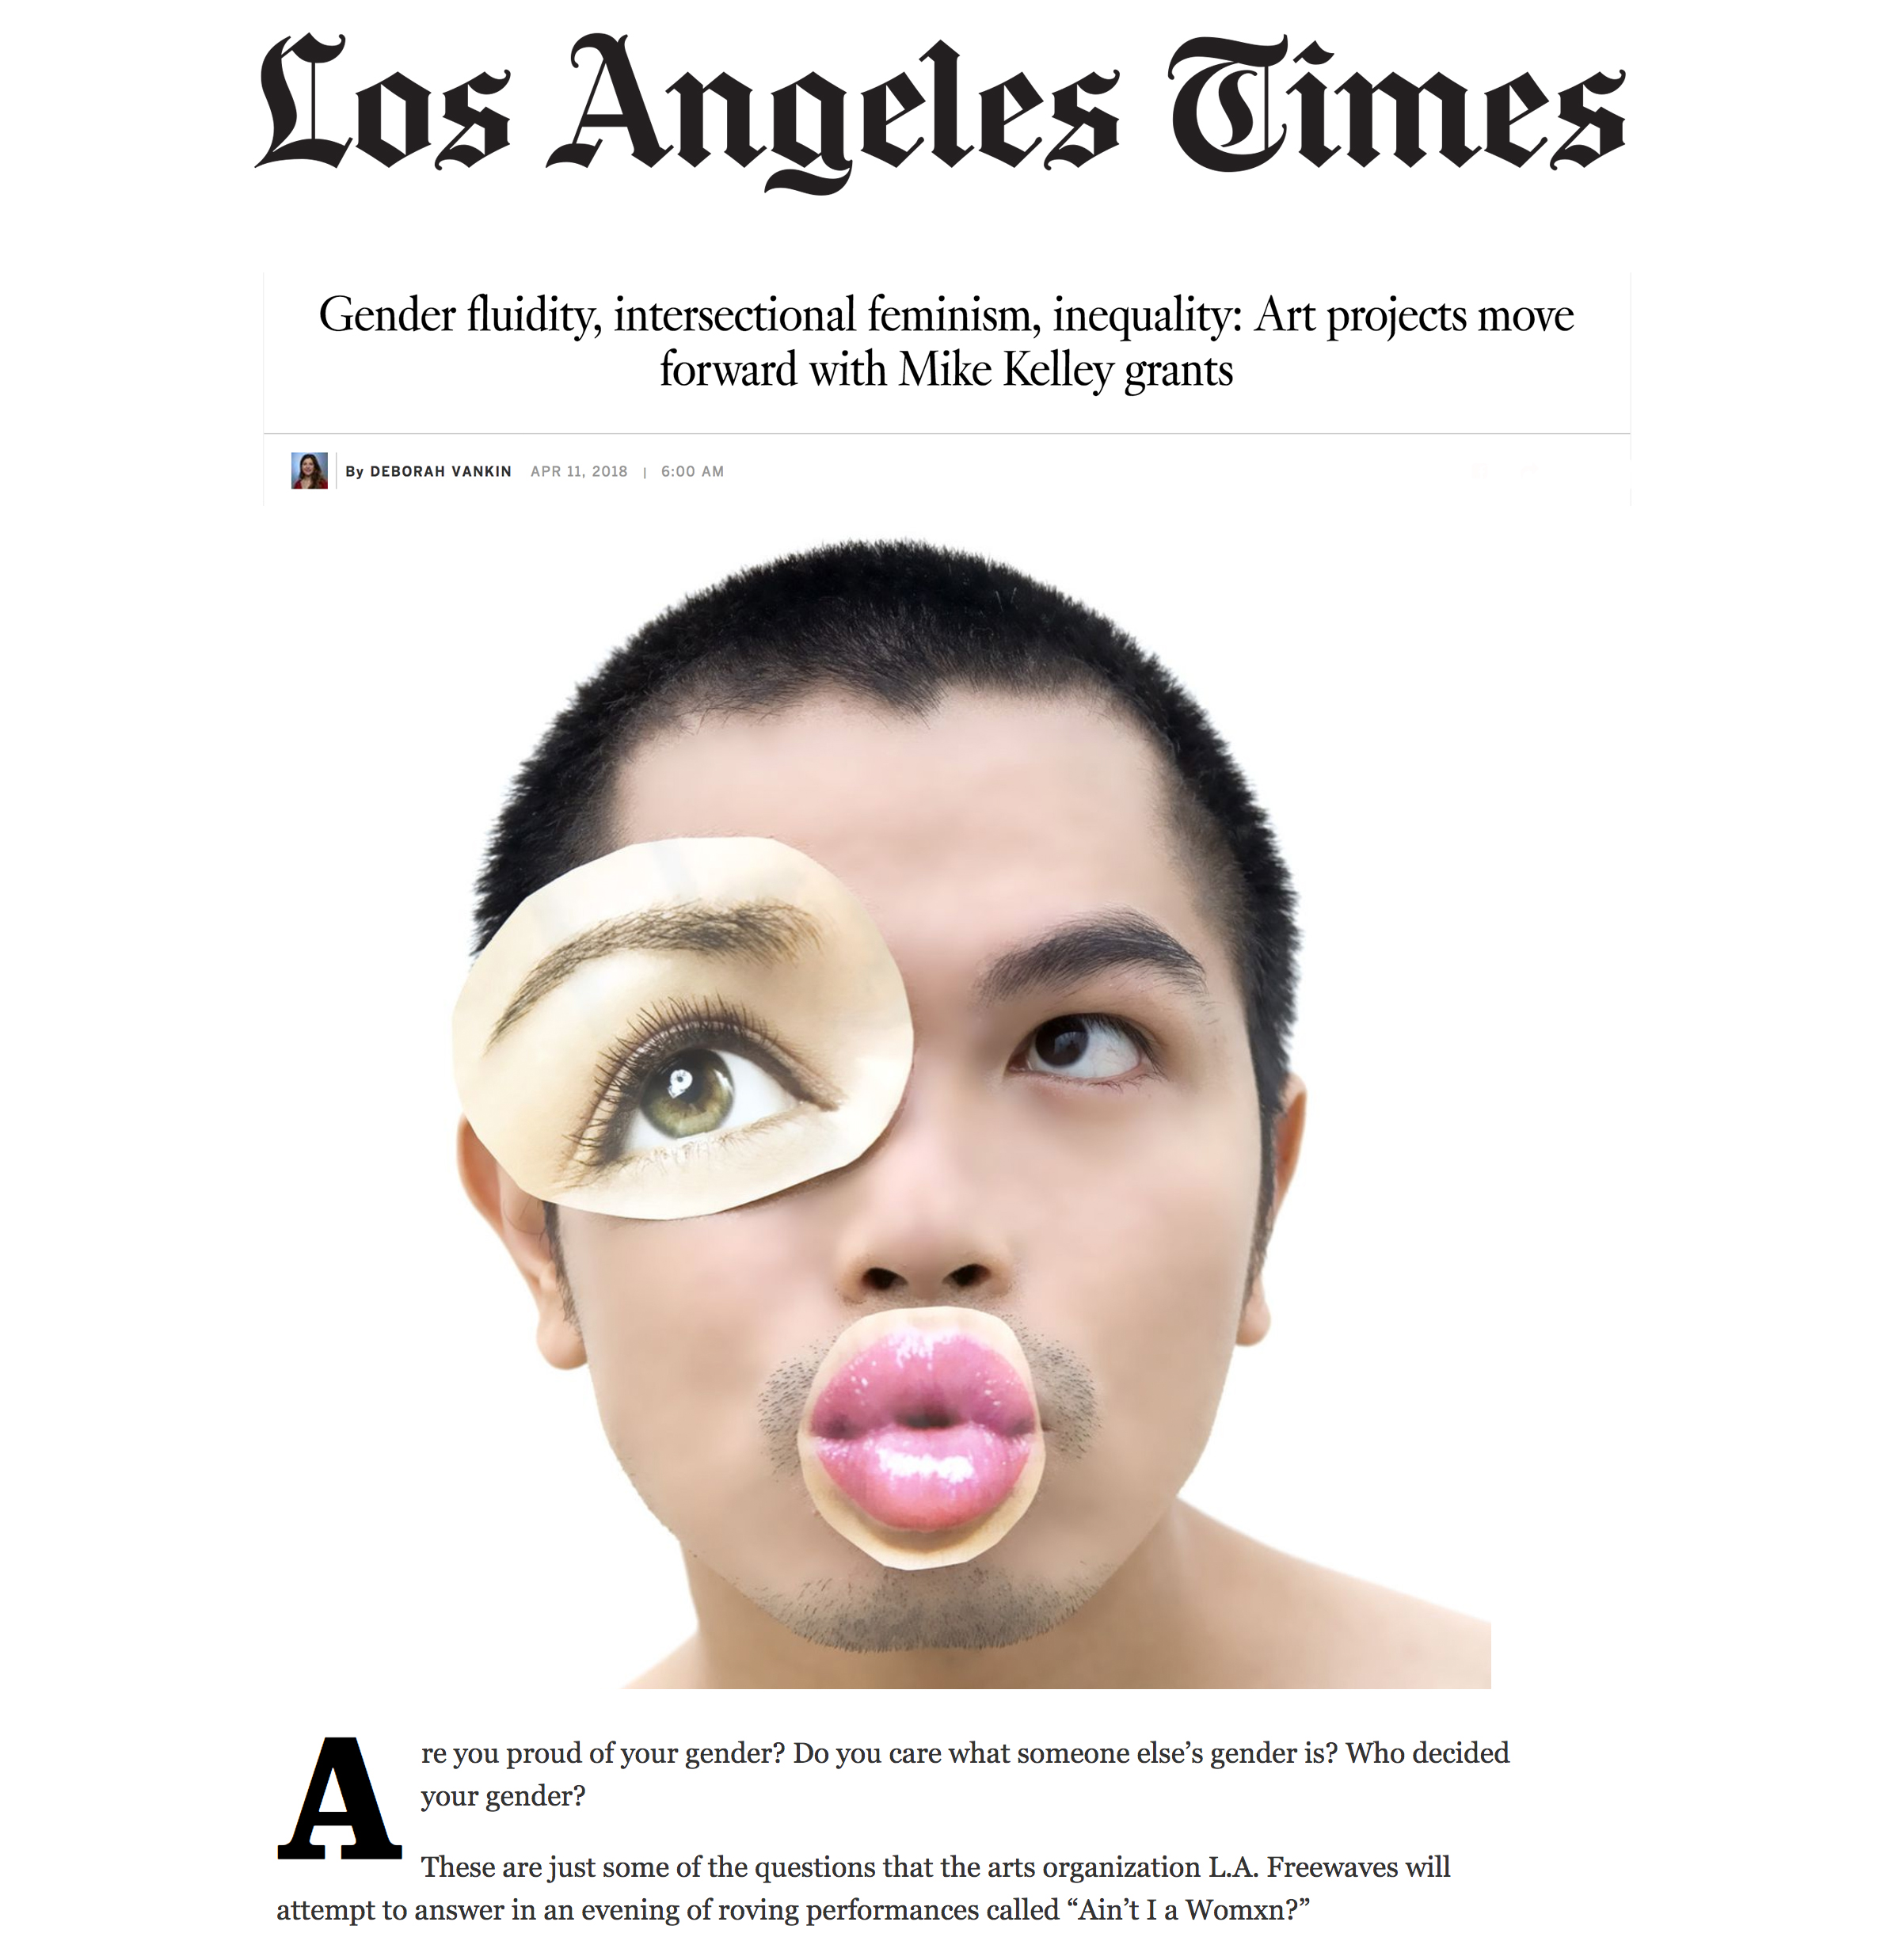 Read more:http://www.latimes.com/entertainment/arts/la-et-cm-mike-kelley- artist-grants-20180411-htmlstory.html